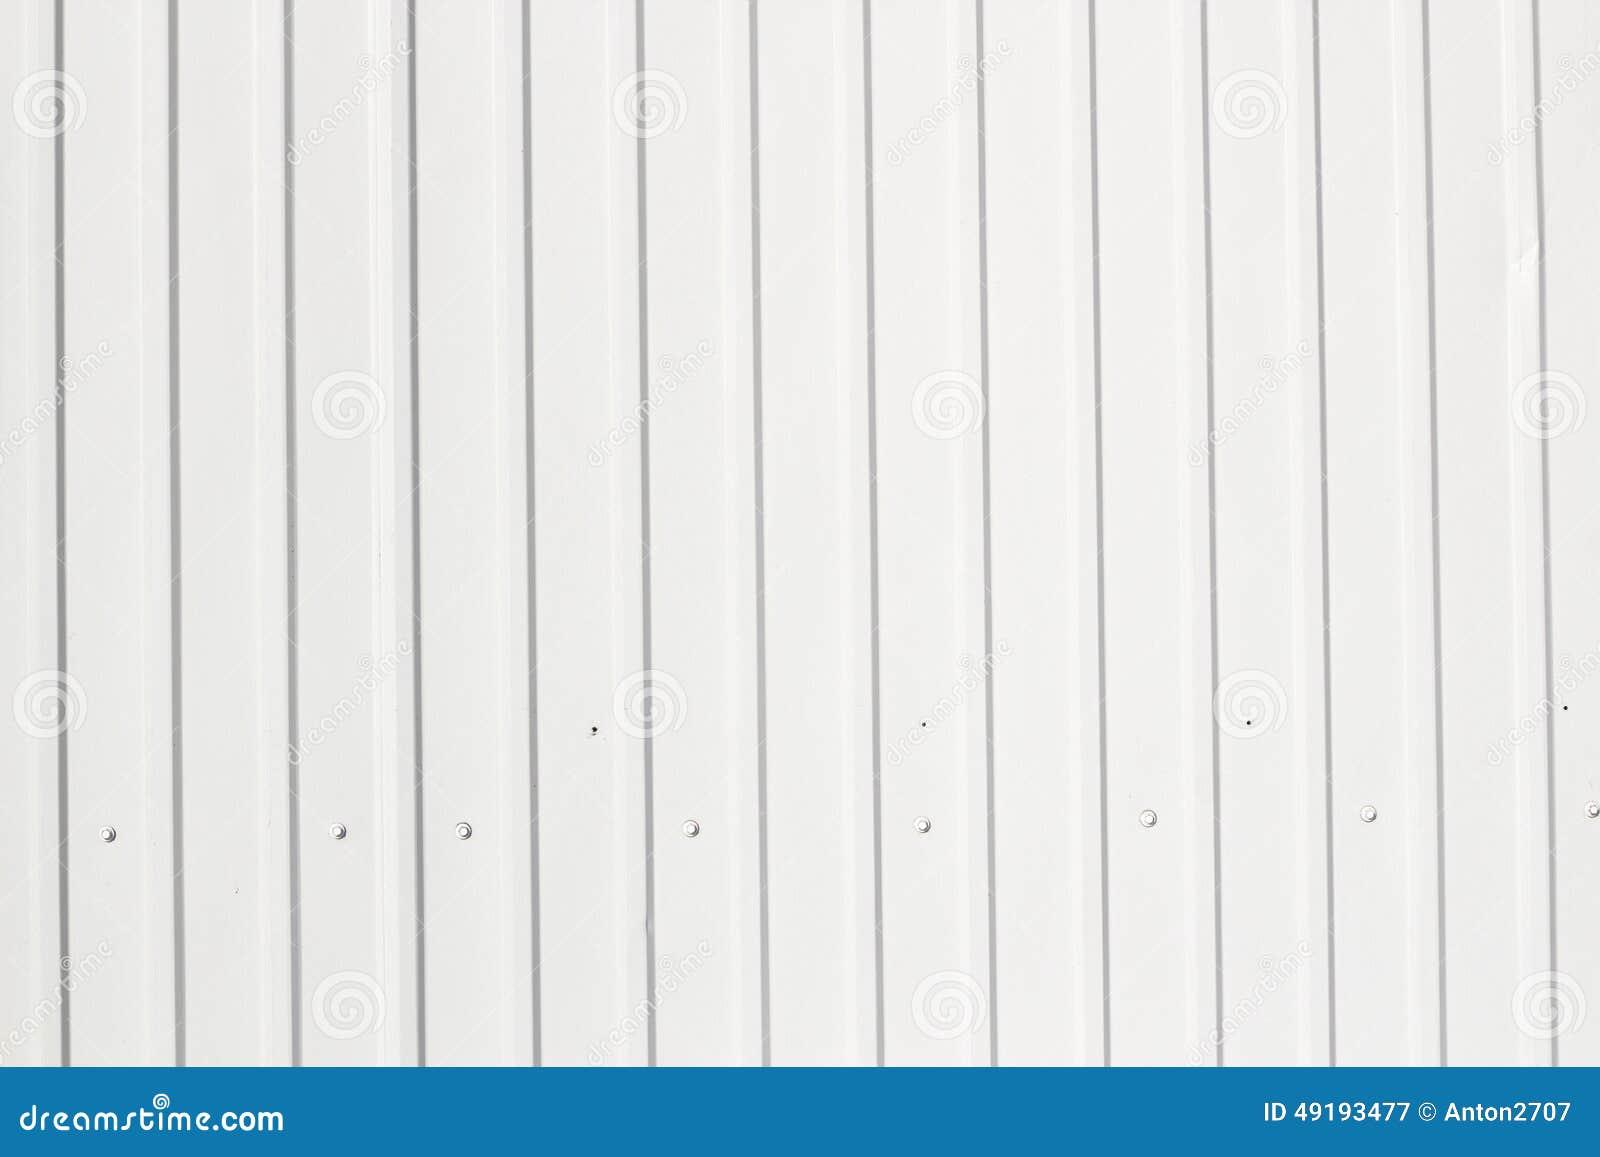 Image Result For Corrugated Metal Roof